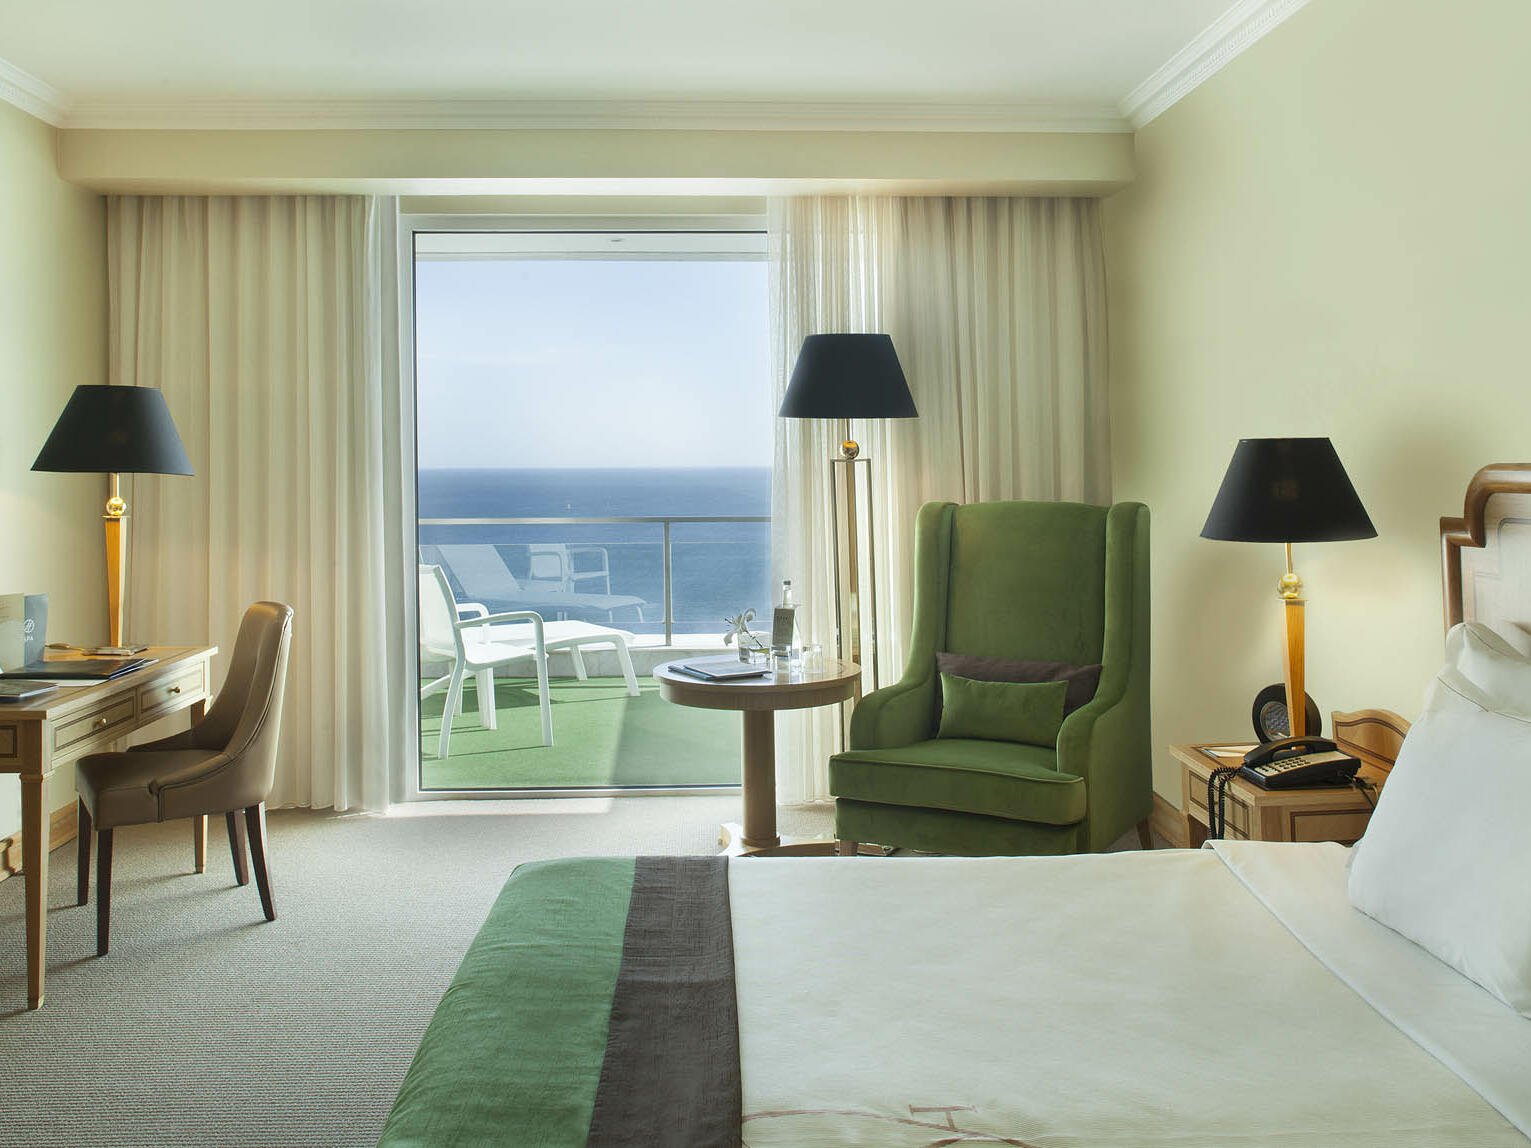 Comfy Bed Room at Hotel Cascais Miragem